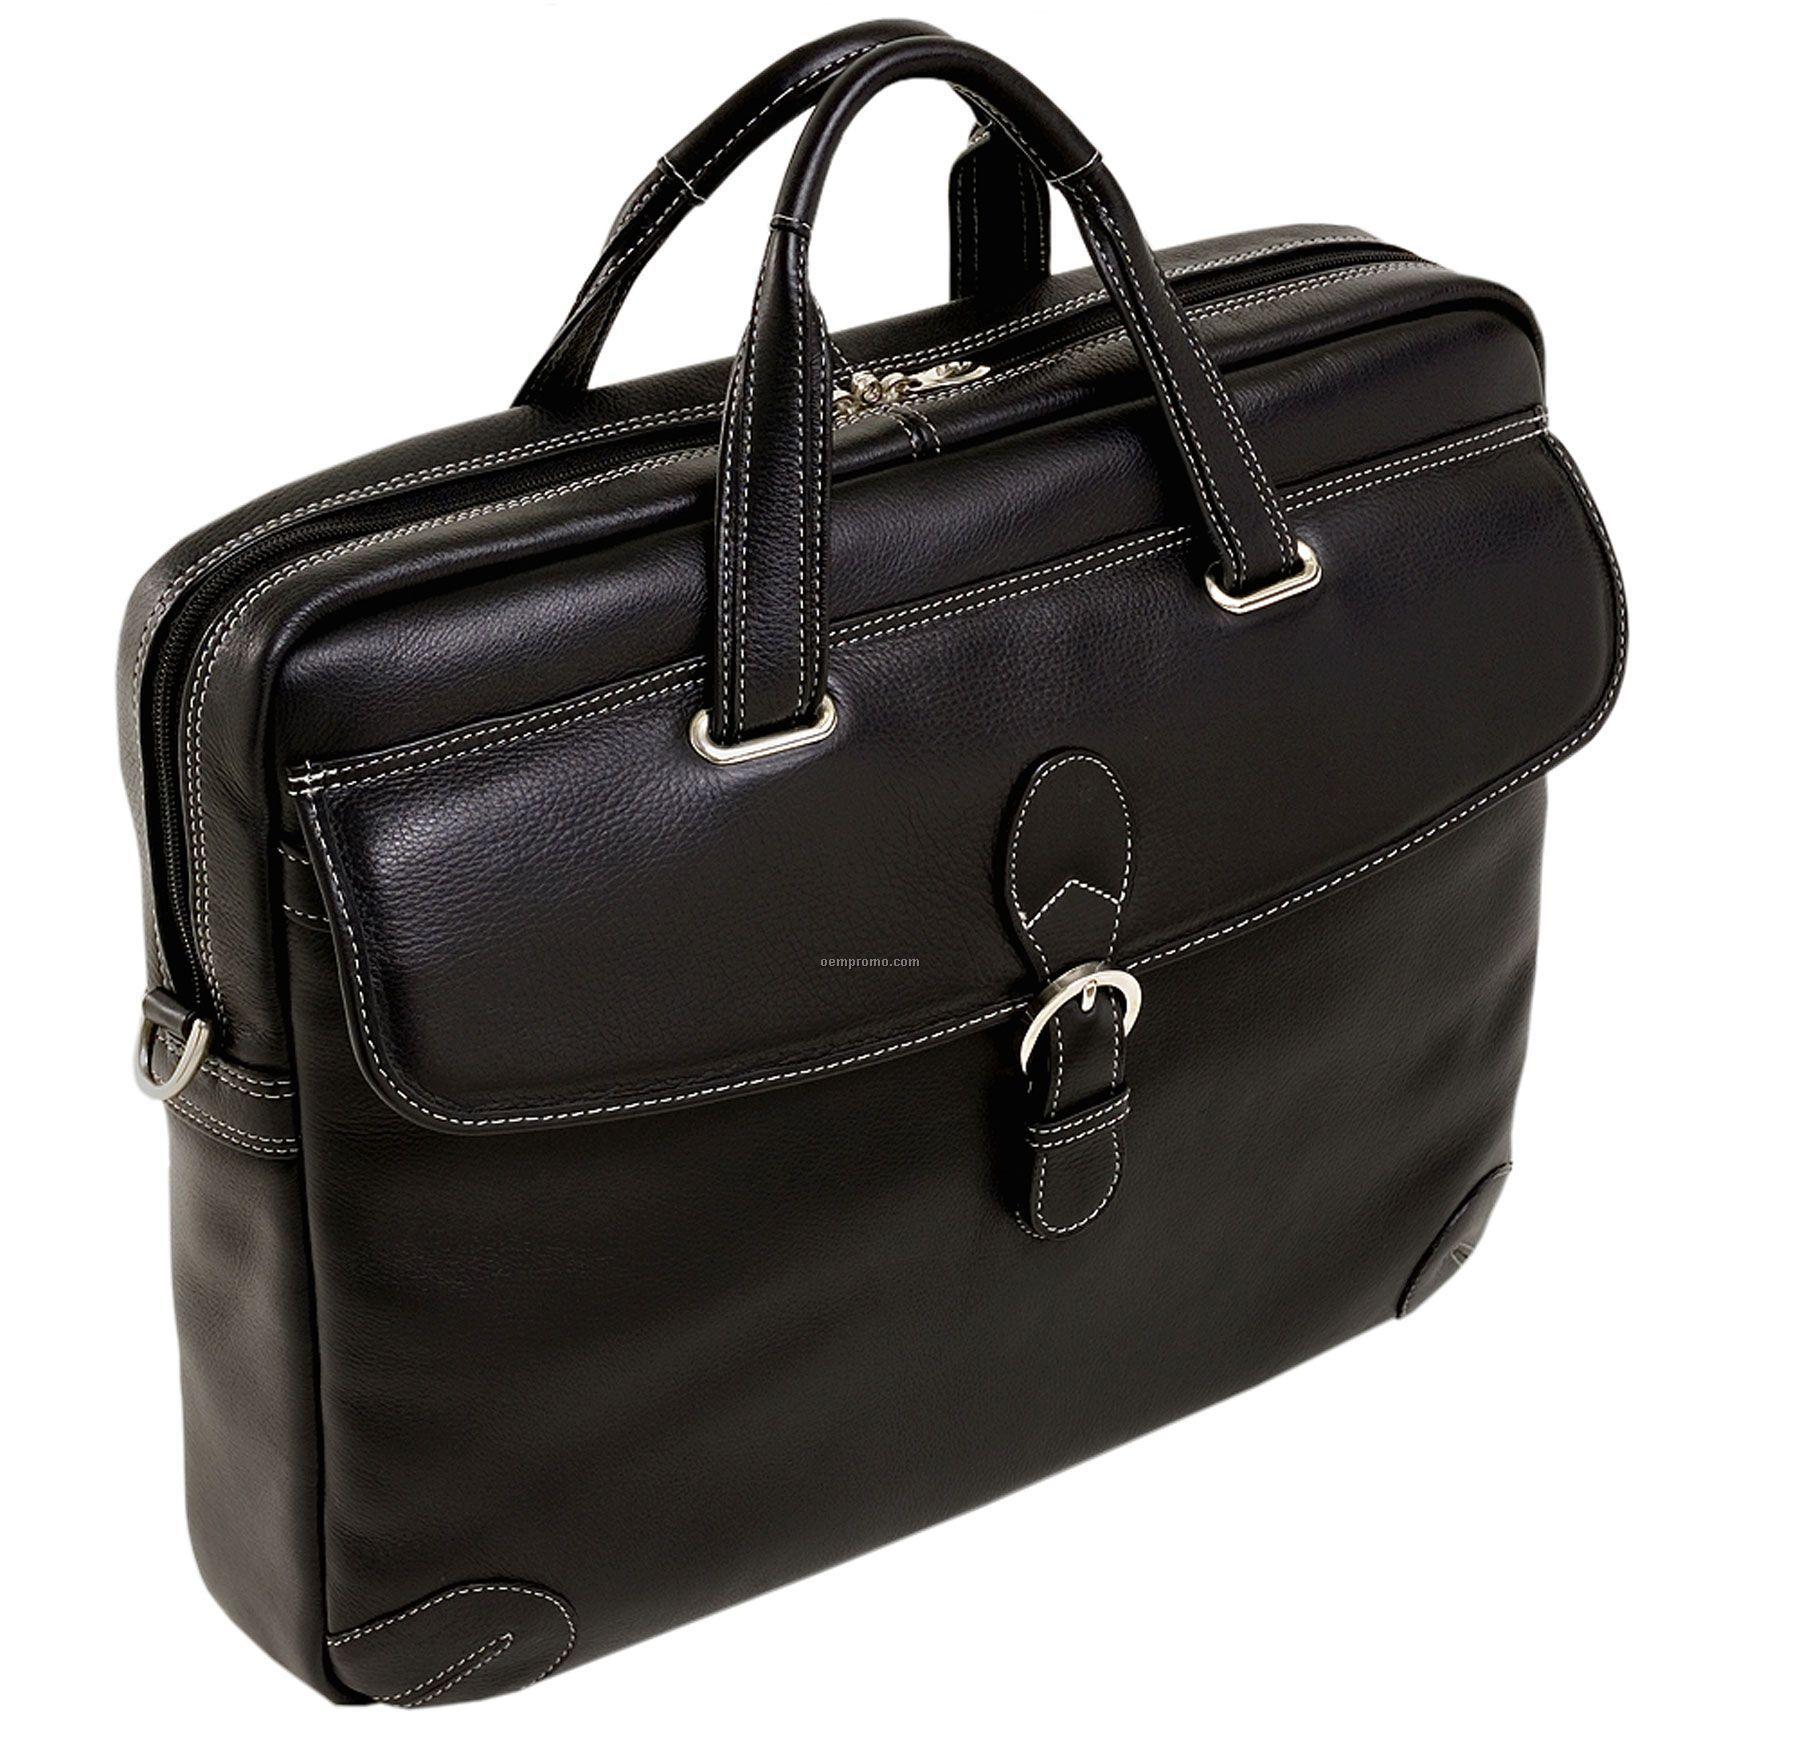 Borella Leather Netbook Laptop Case - Black